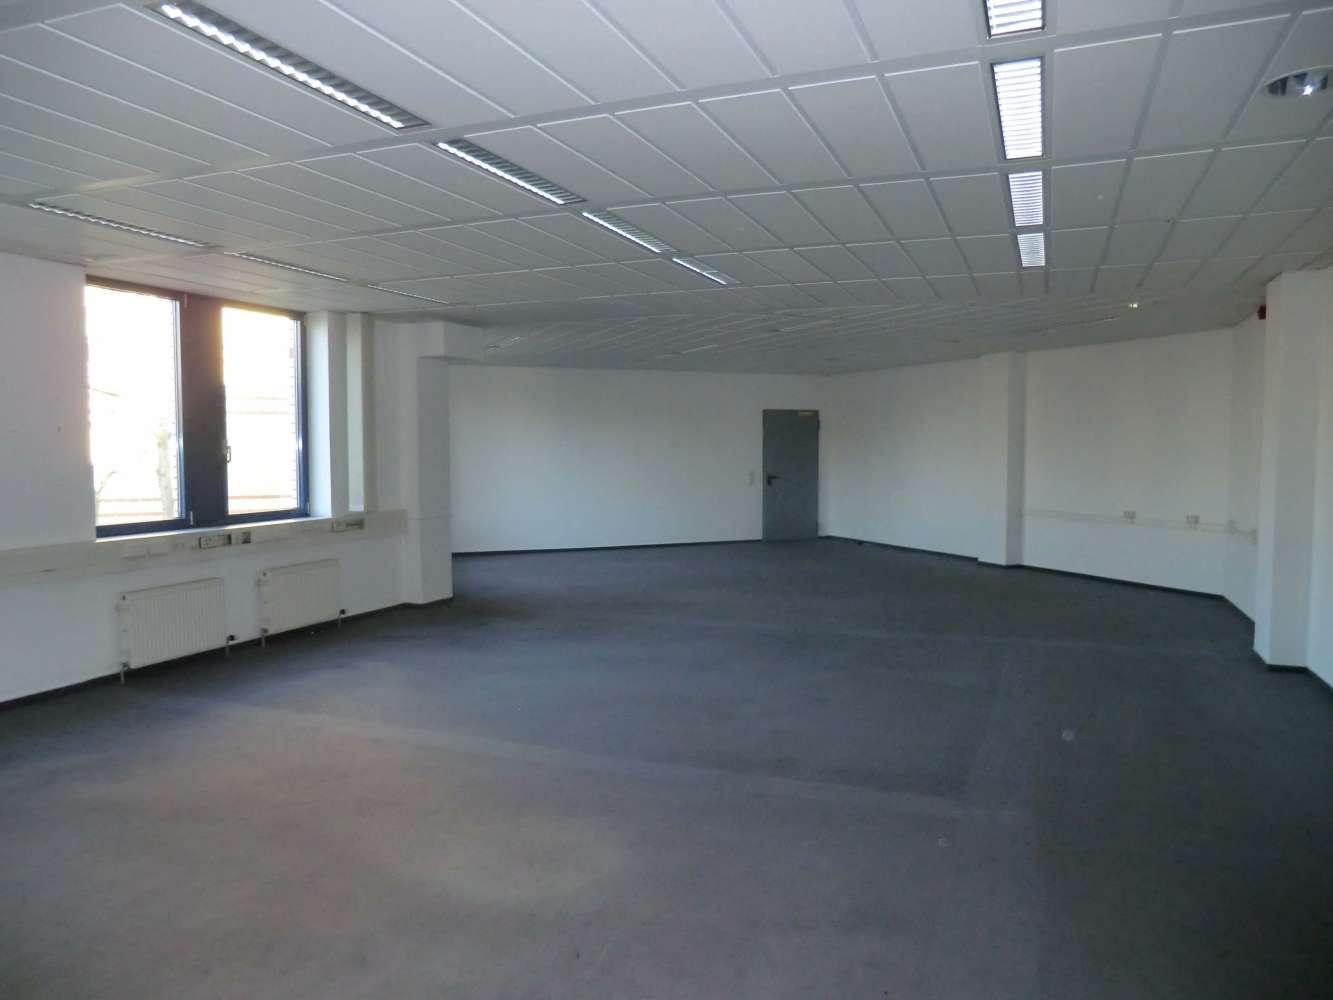 Büros Langen (hessen), 63225 - Büro - Langen (Hessen), Industriegebiet - F0169 - 9409881